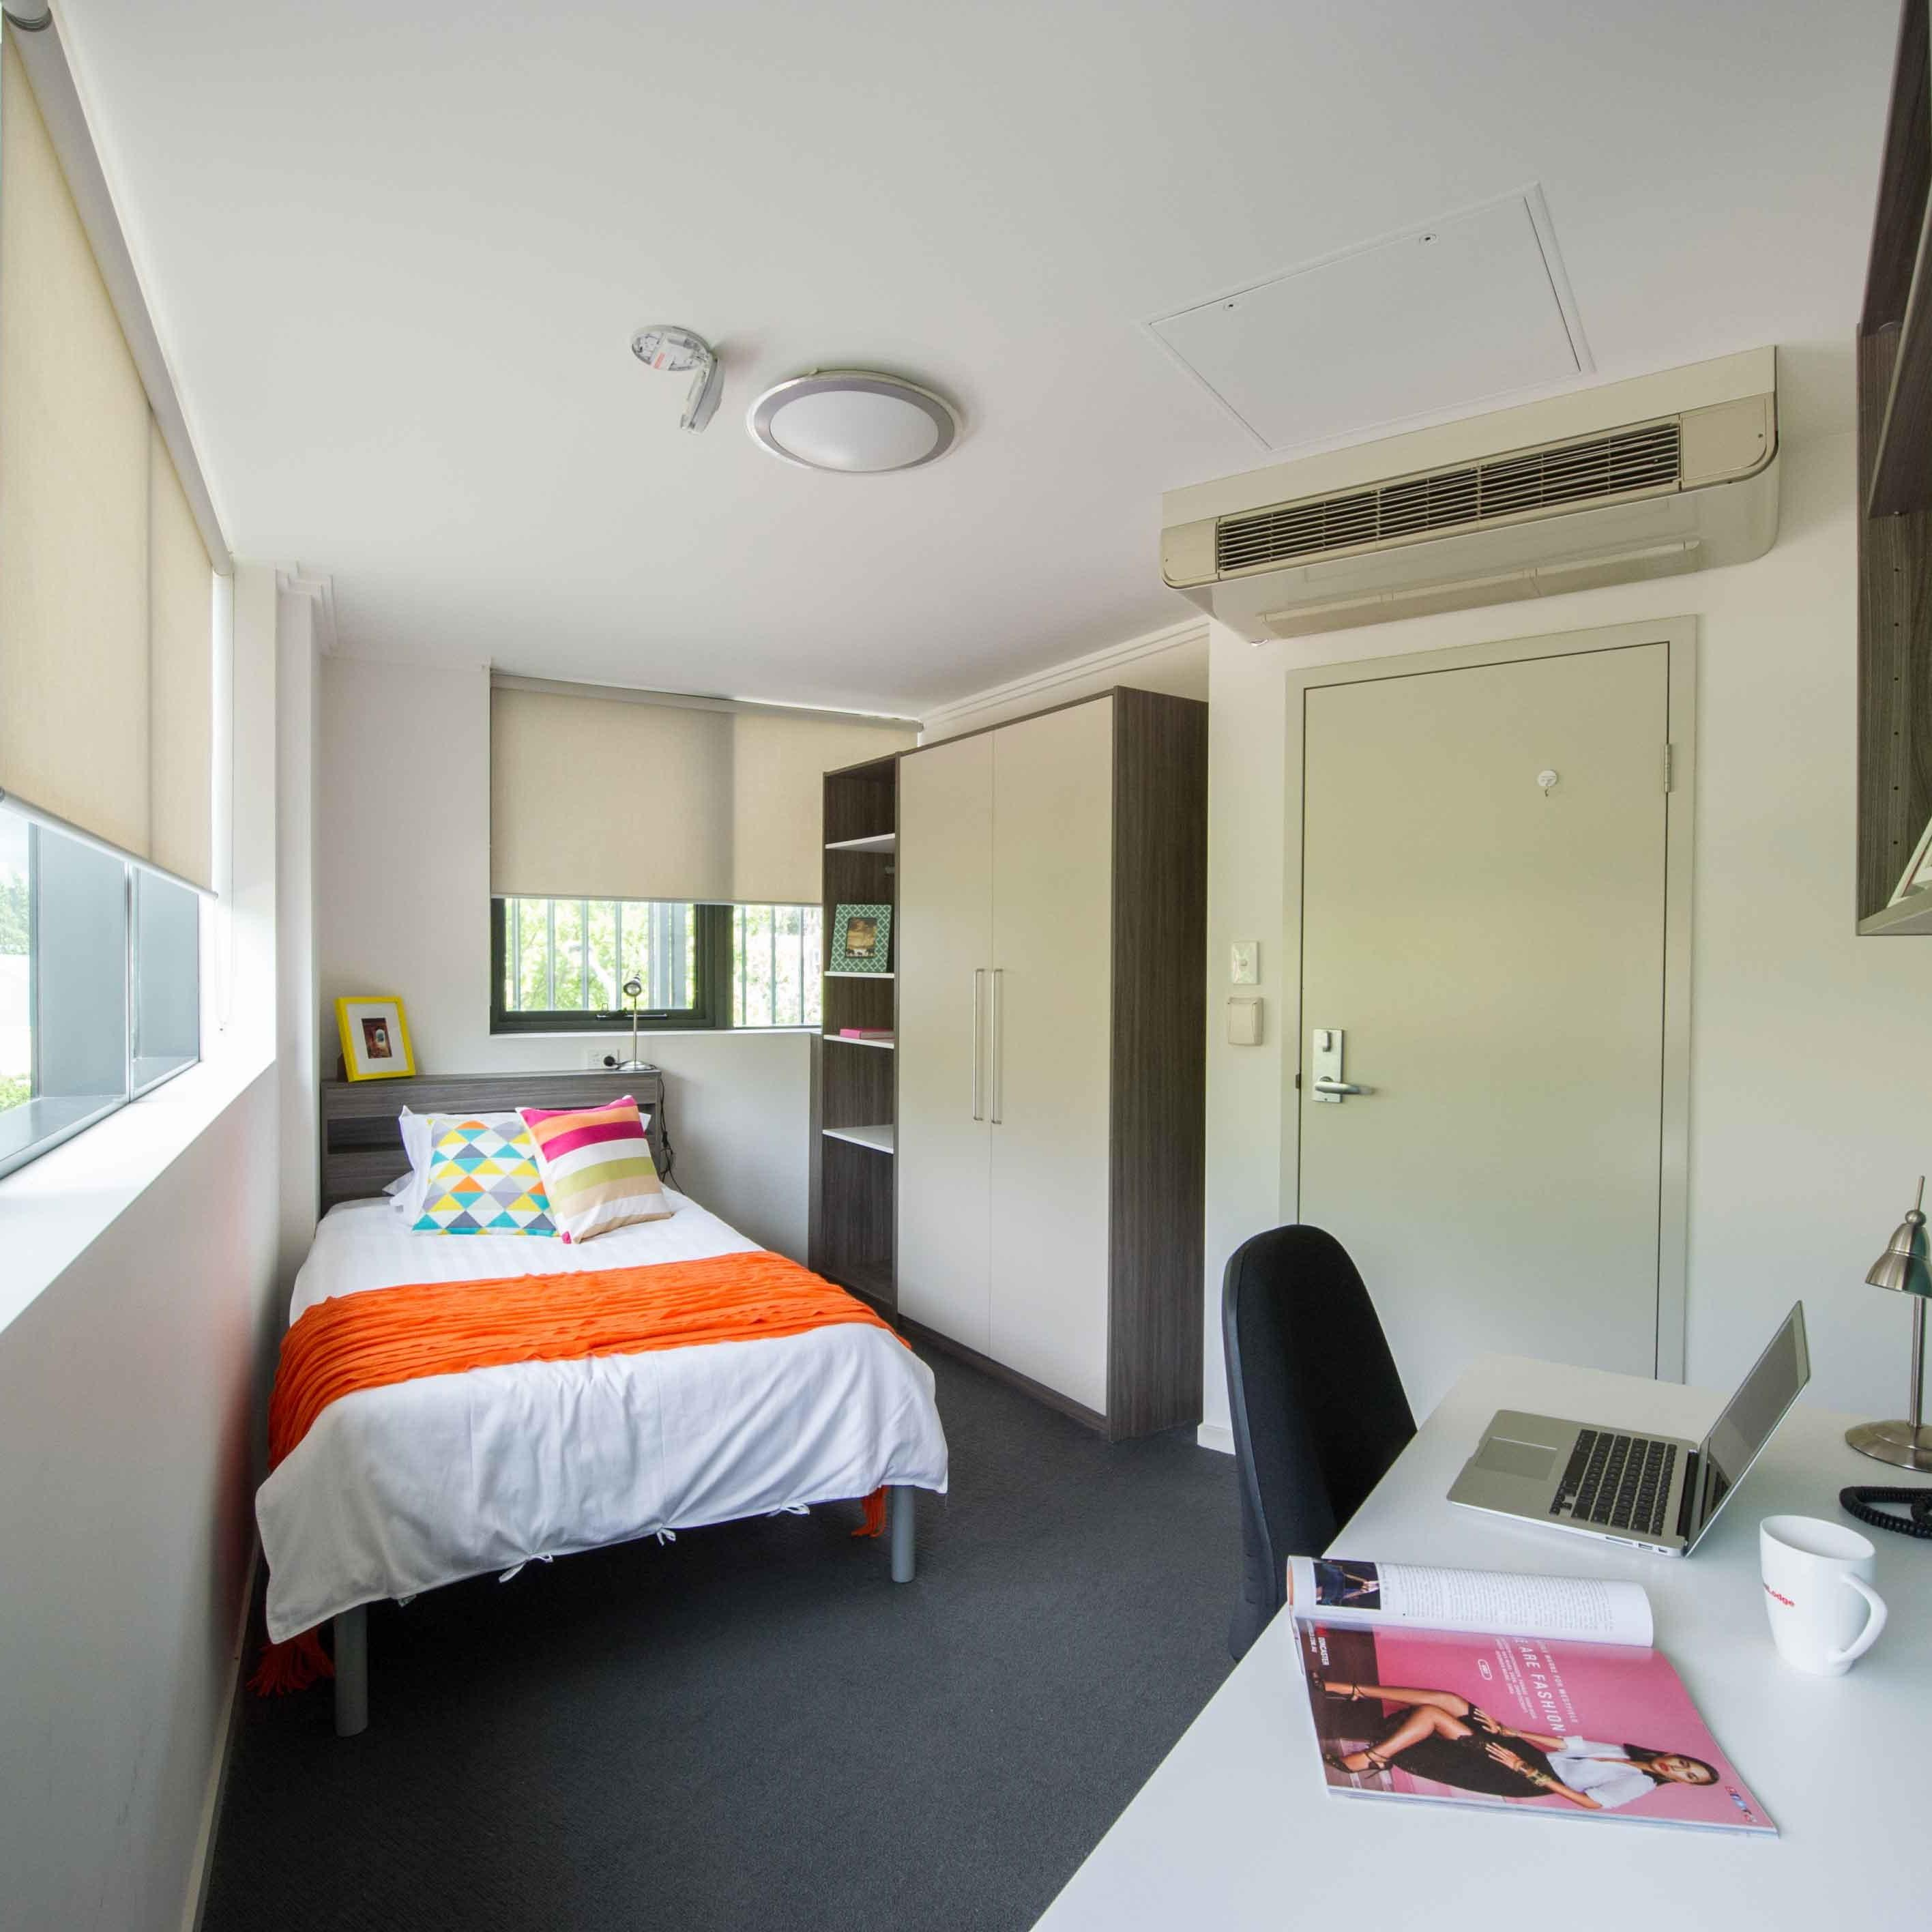 UniLodge @ ANU Warrambul Lodge 3 Bedroom Apartment